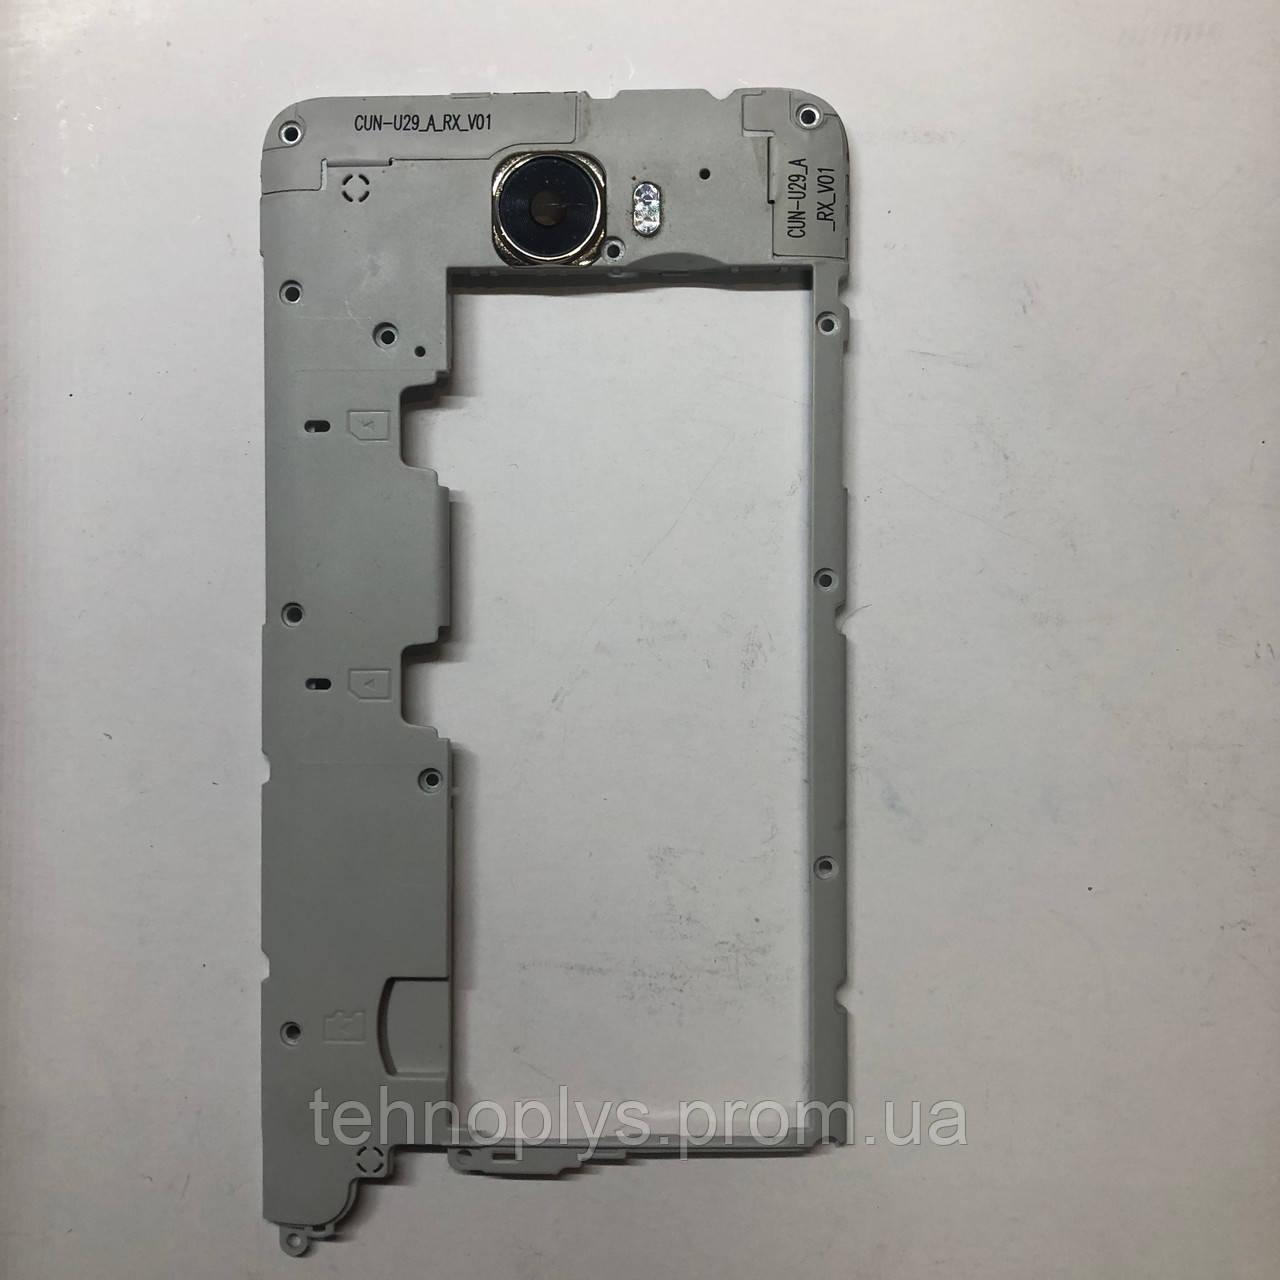 Huawei cun-u29 задня кришка з склом камери БУ